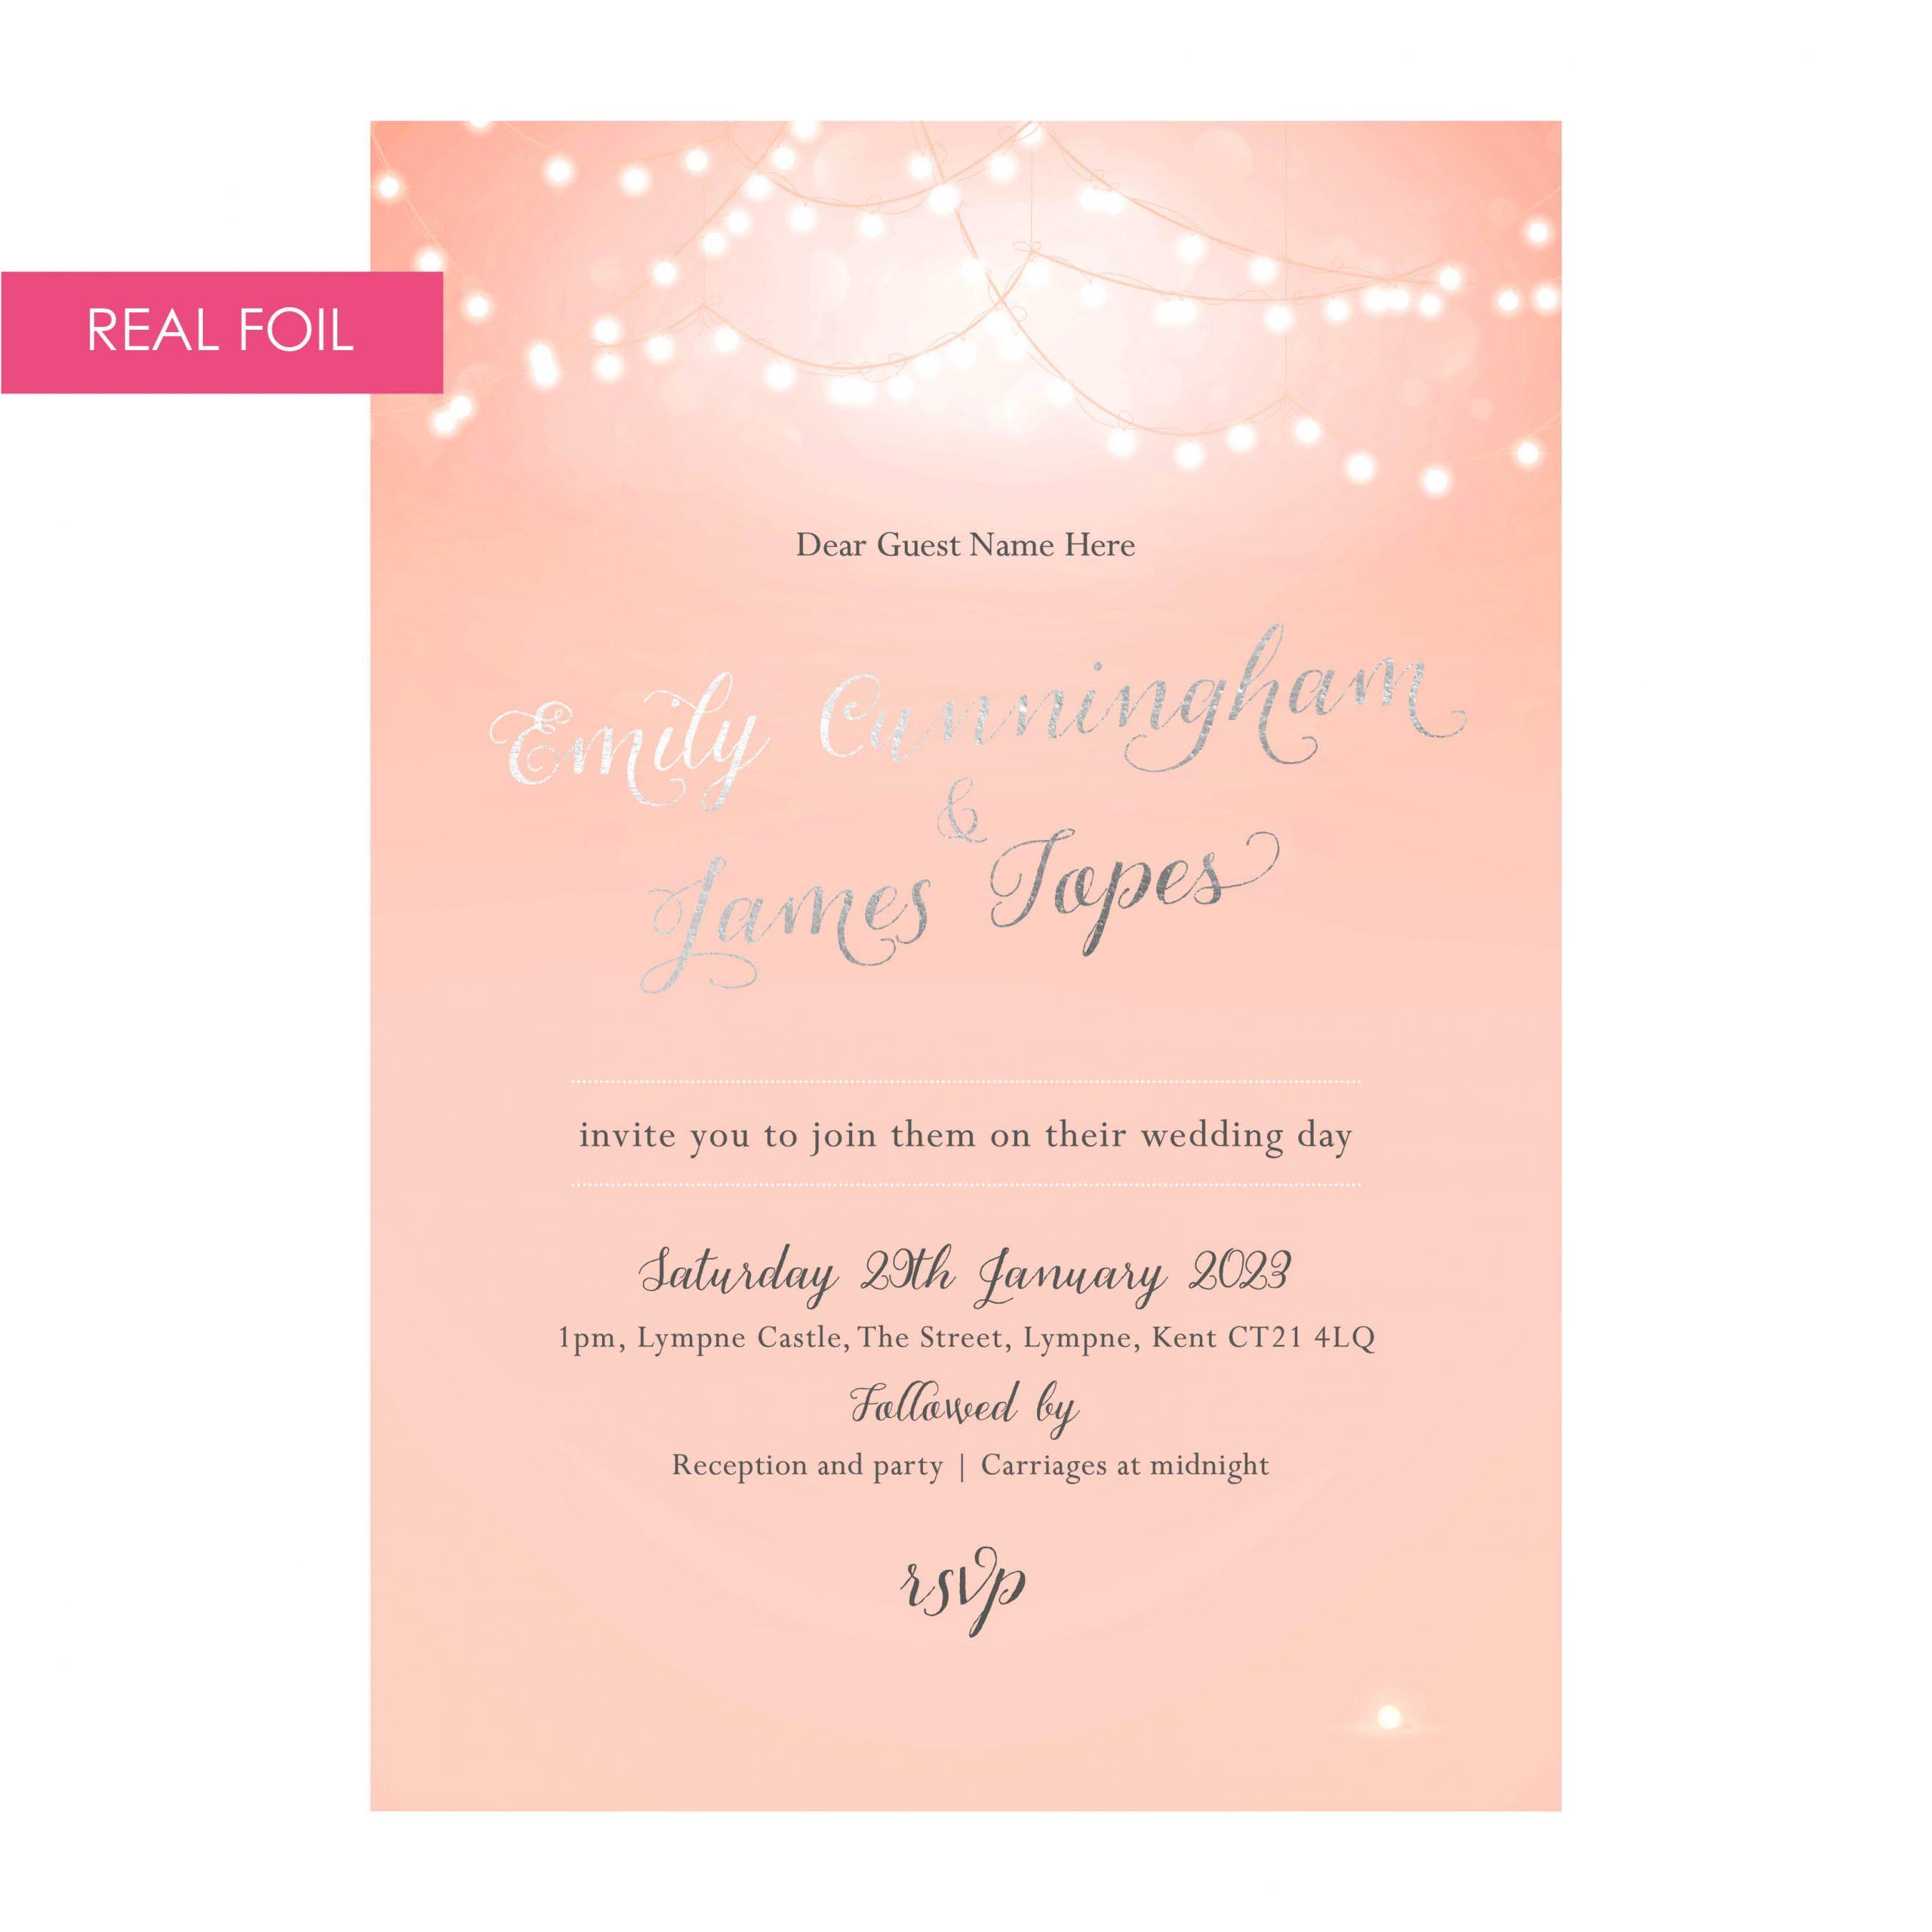 Nightglow invites pink silver foil